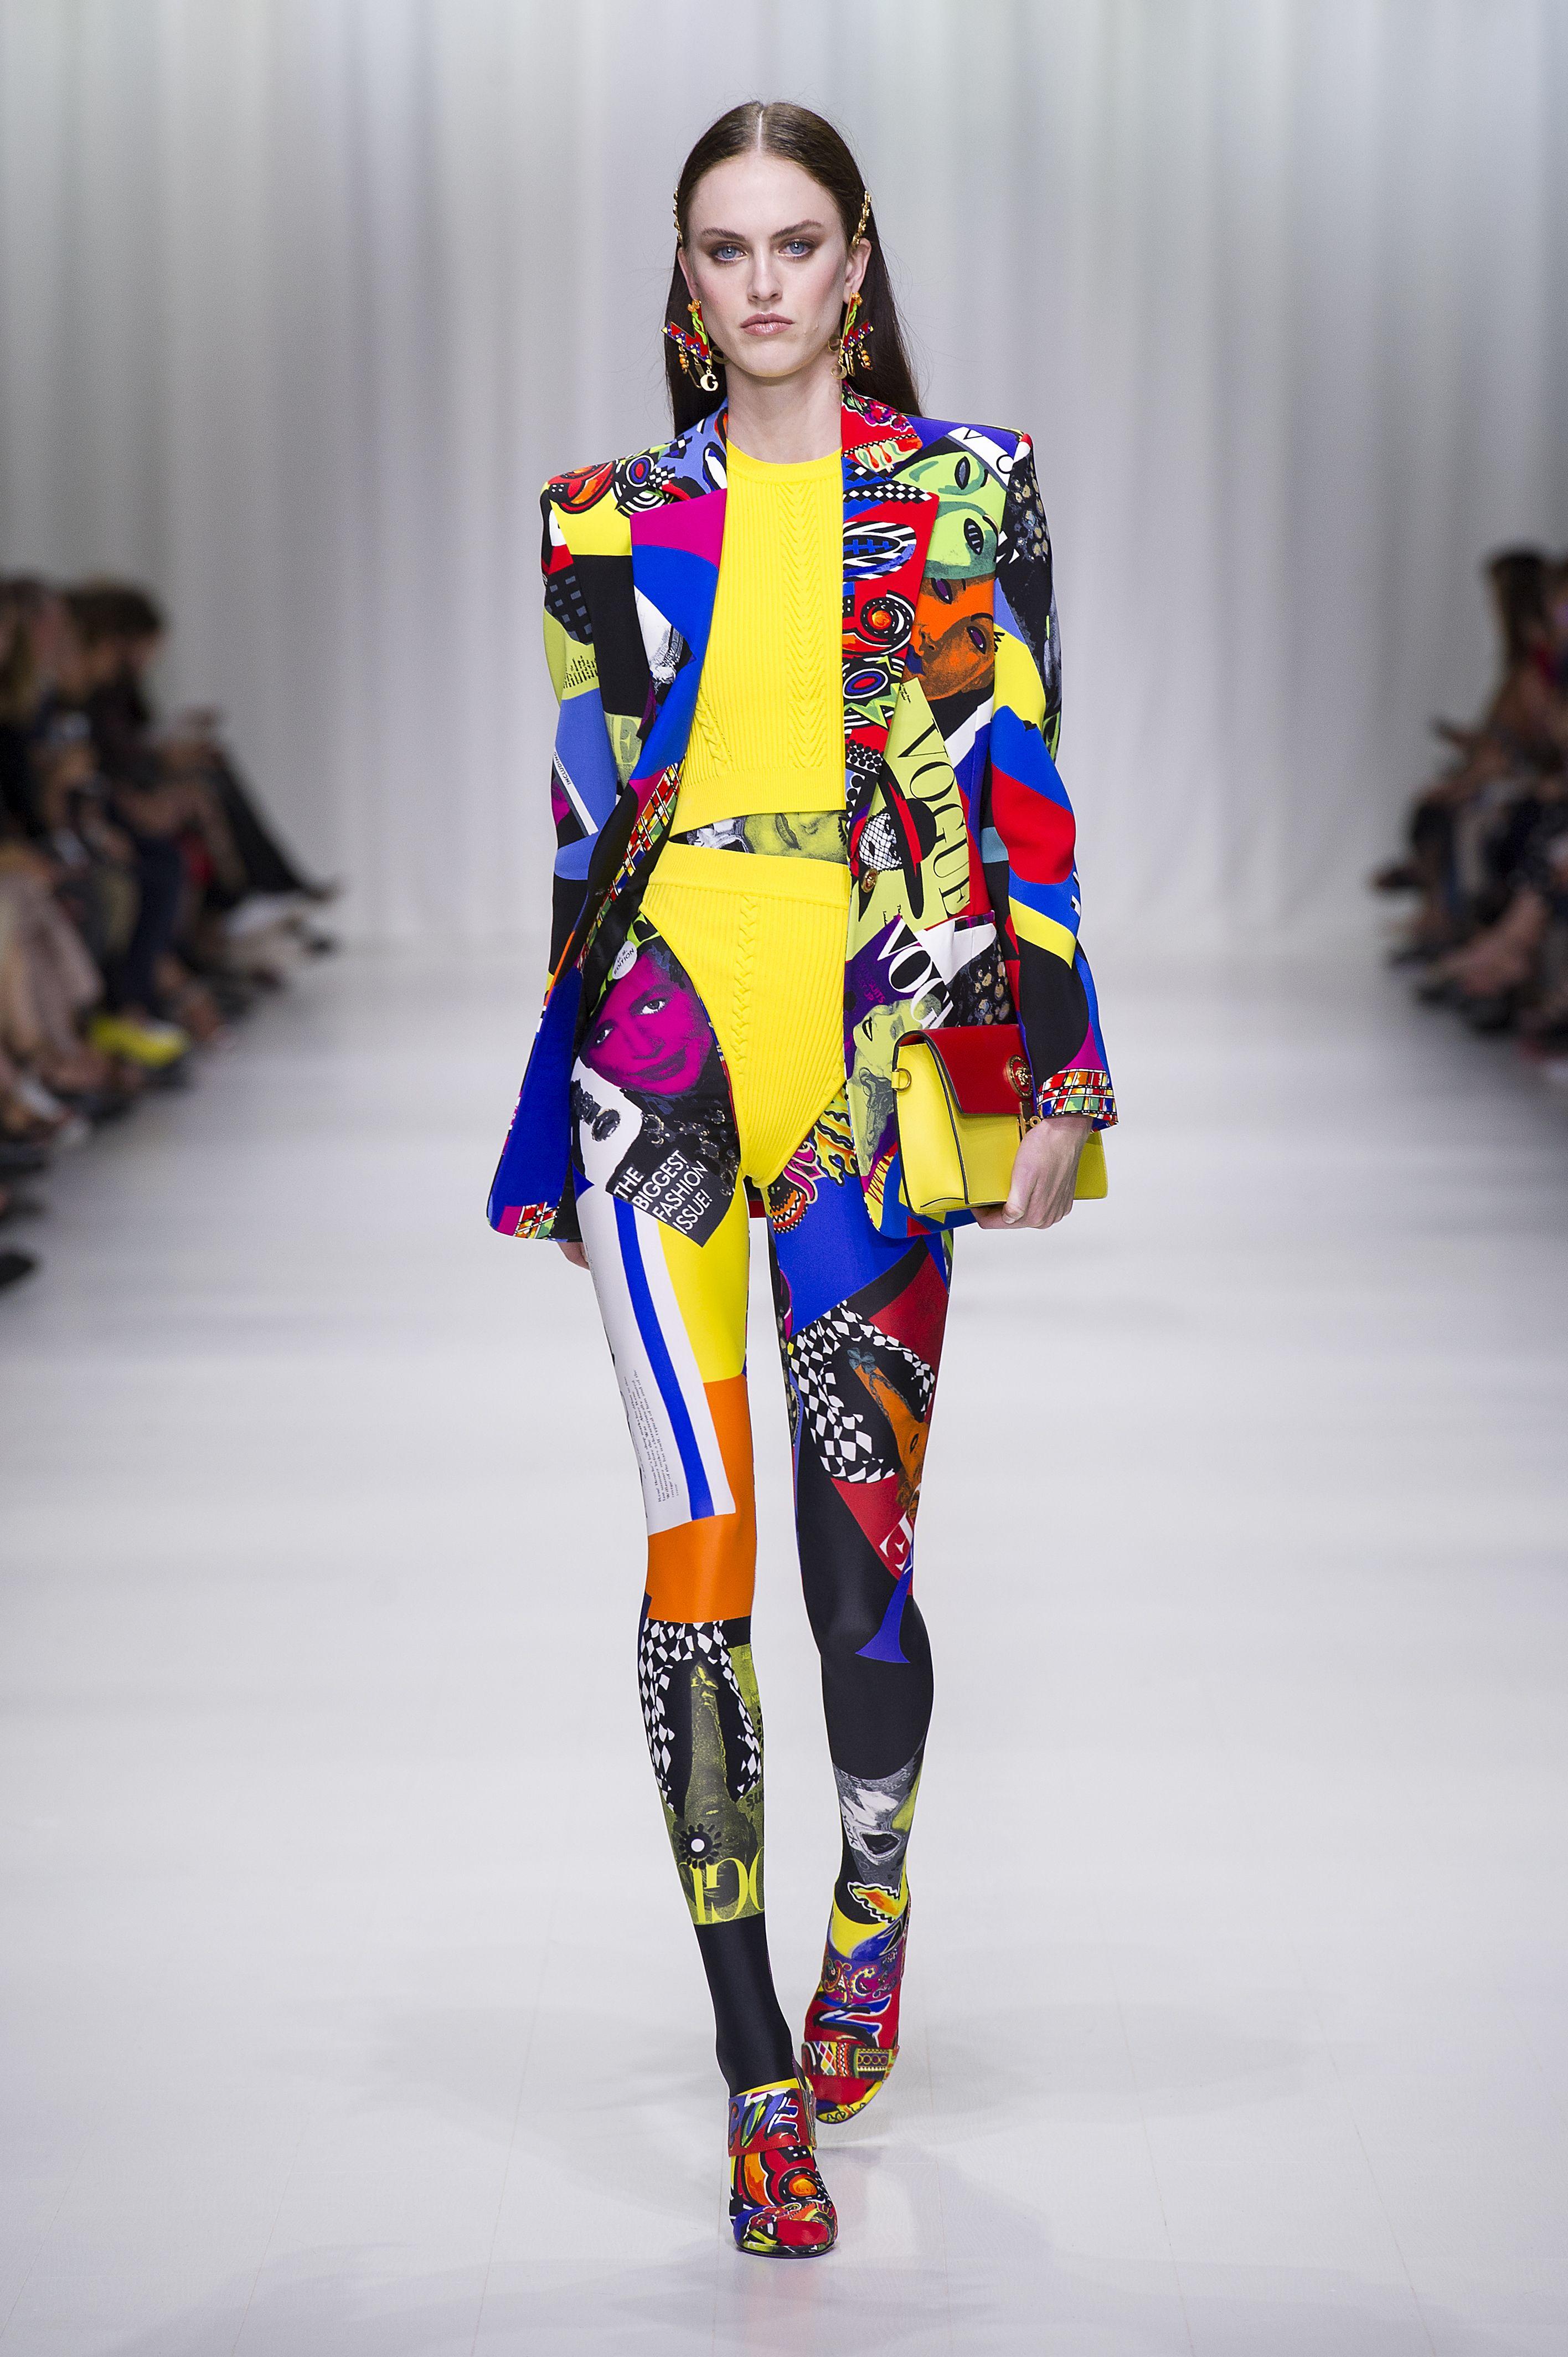 Versace spring summer 2018 | Pop art fashion, Fashion